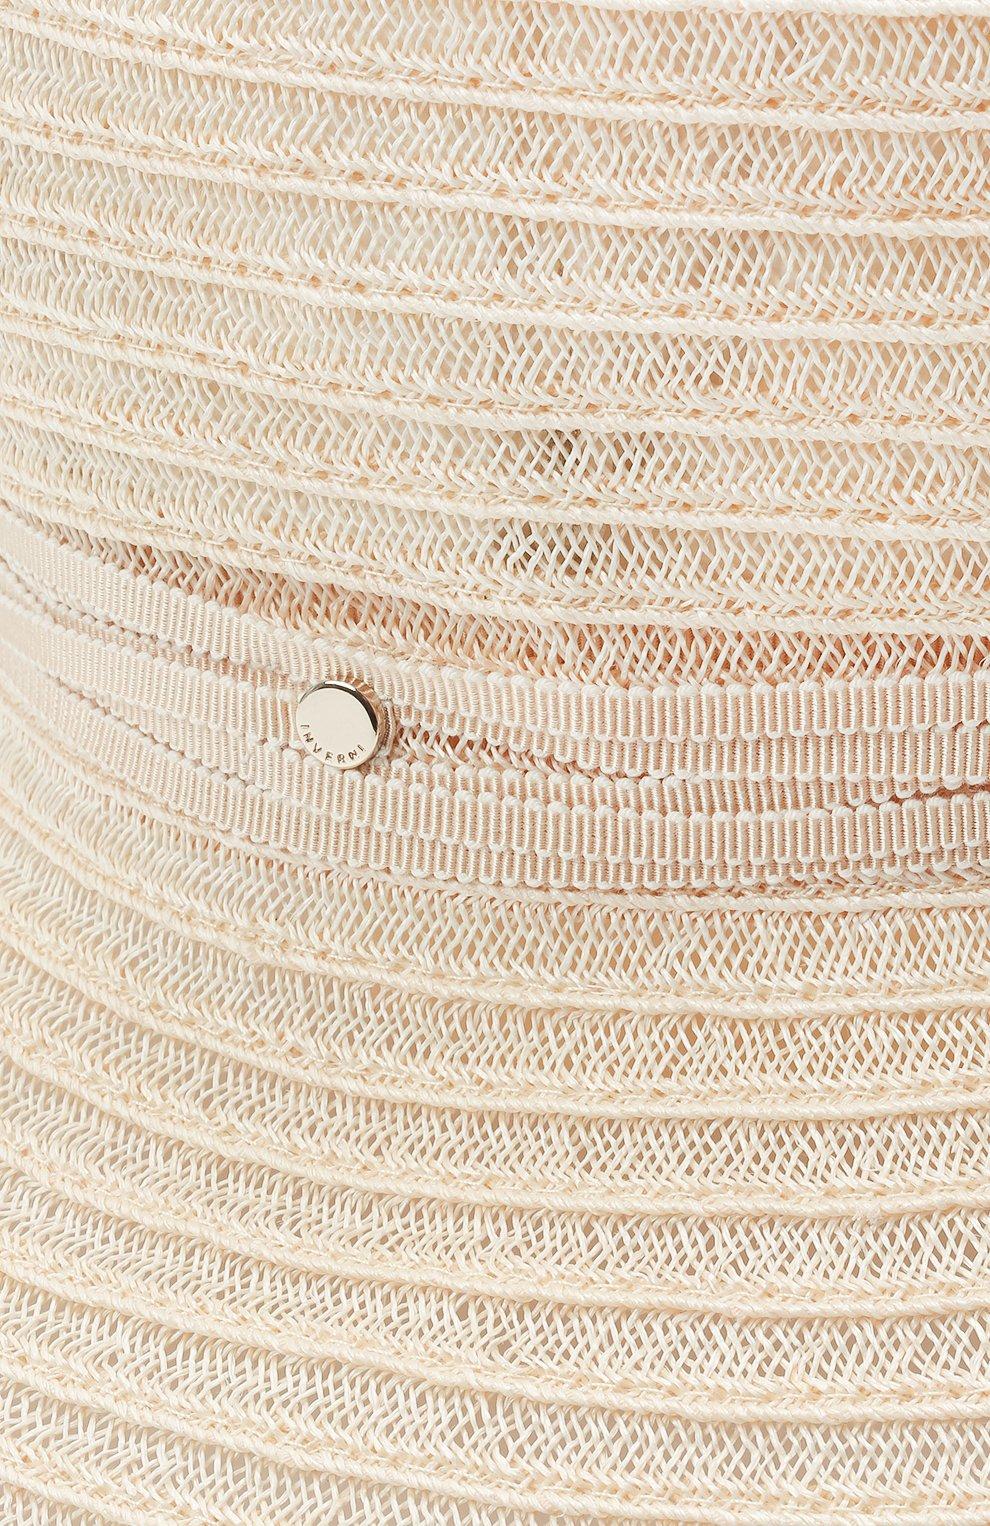 Женская шляпа INVERNI бежевого цвета, арт. 5197 CC | Фото 3